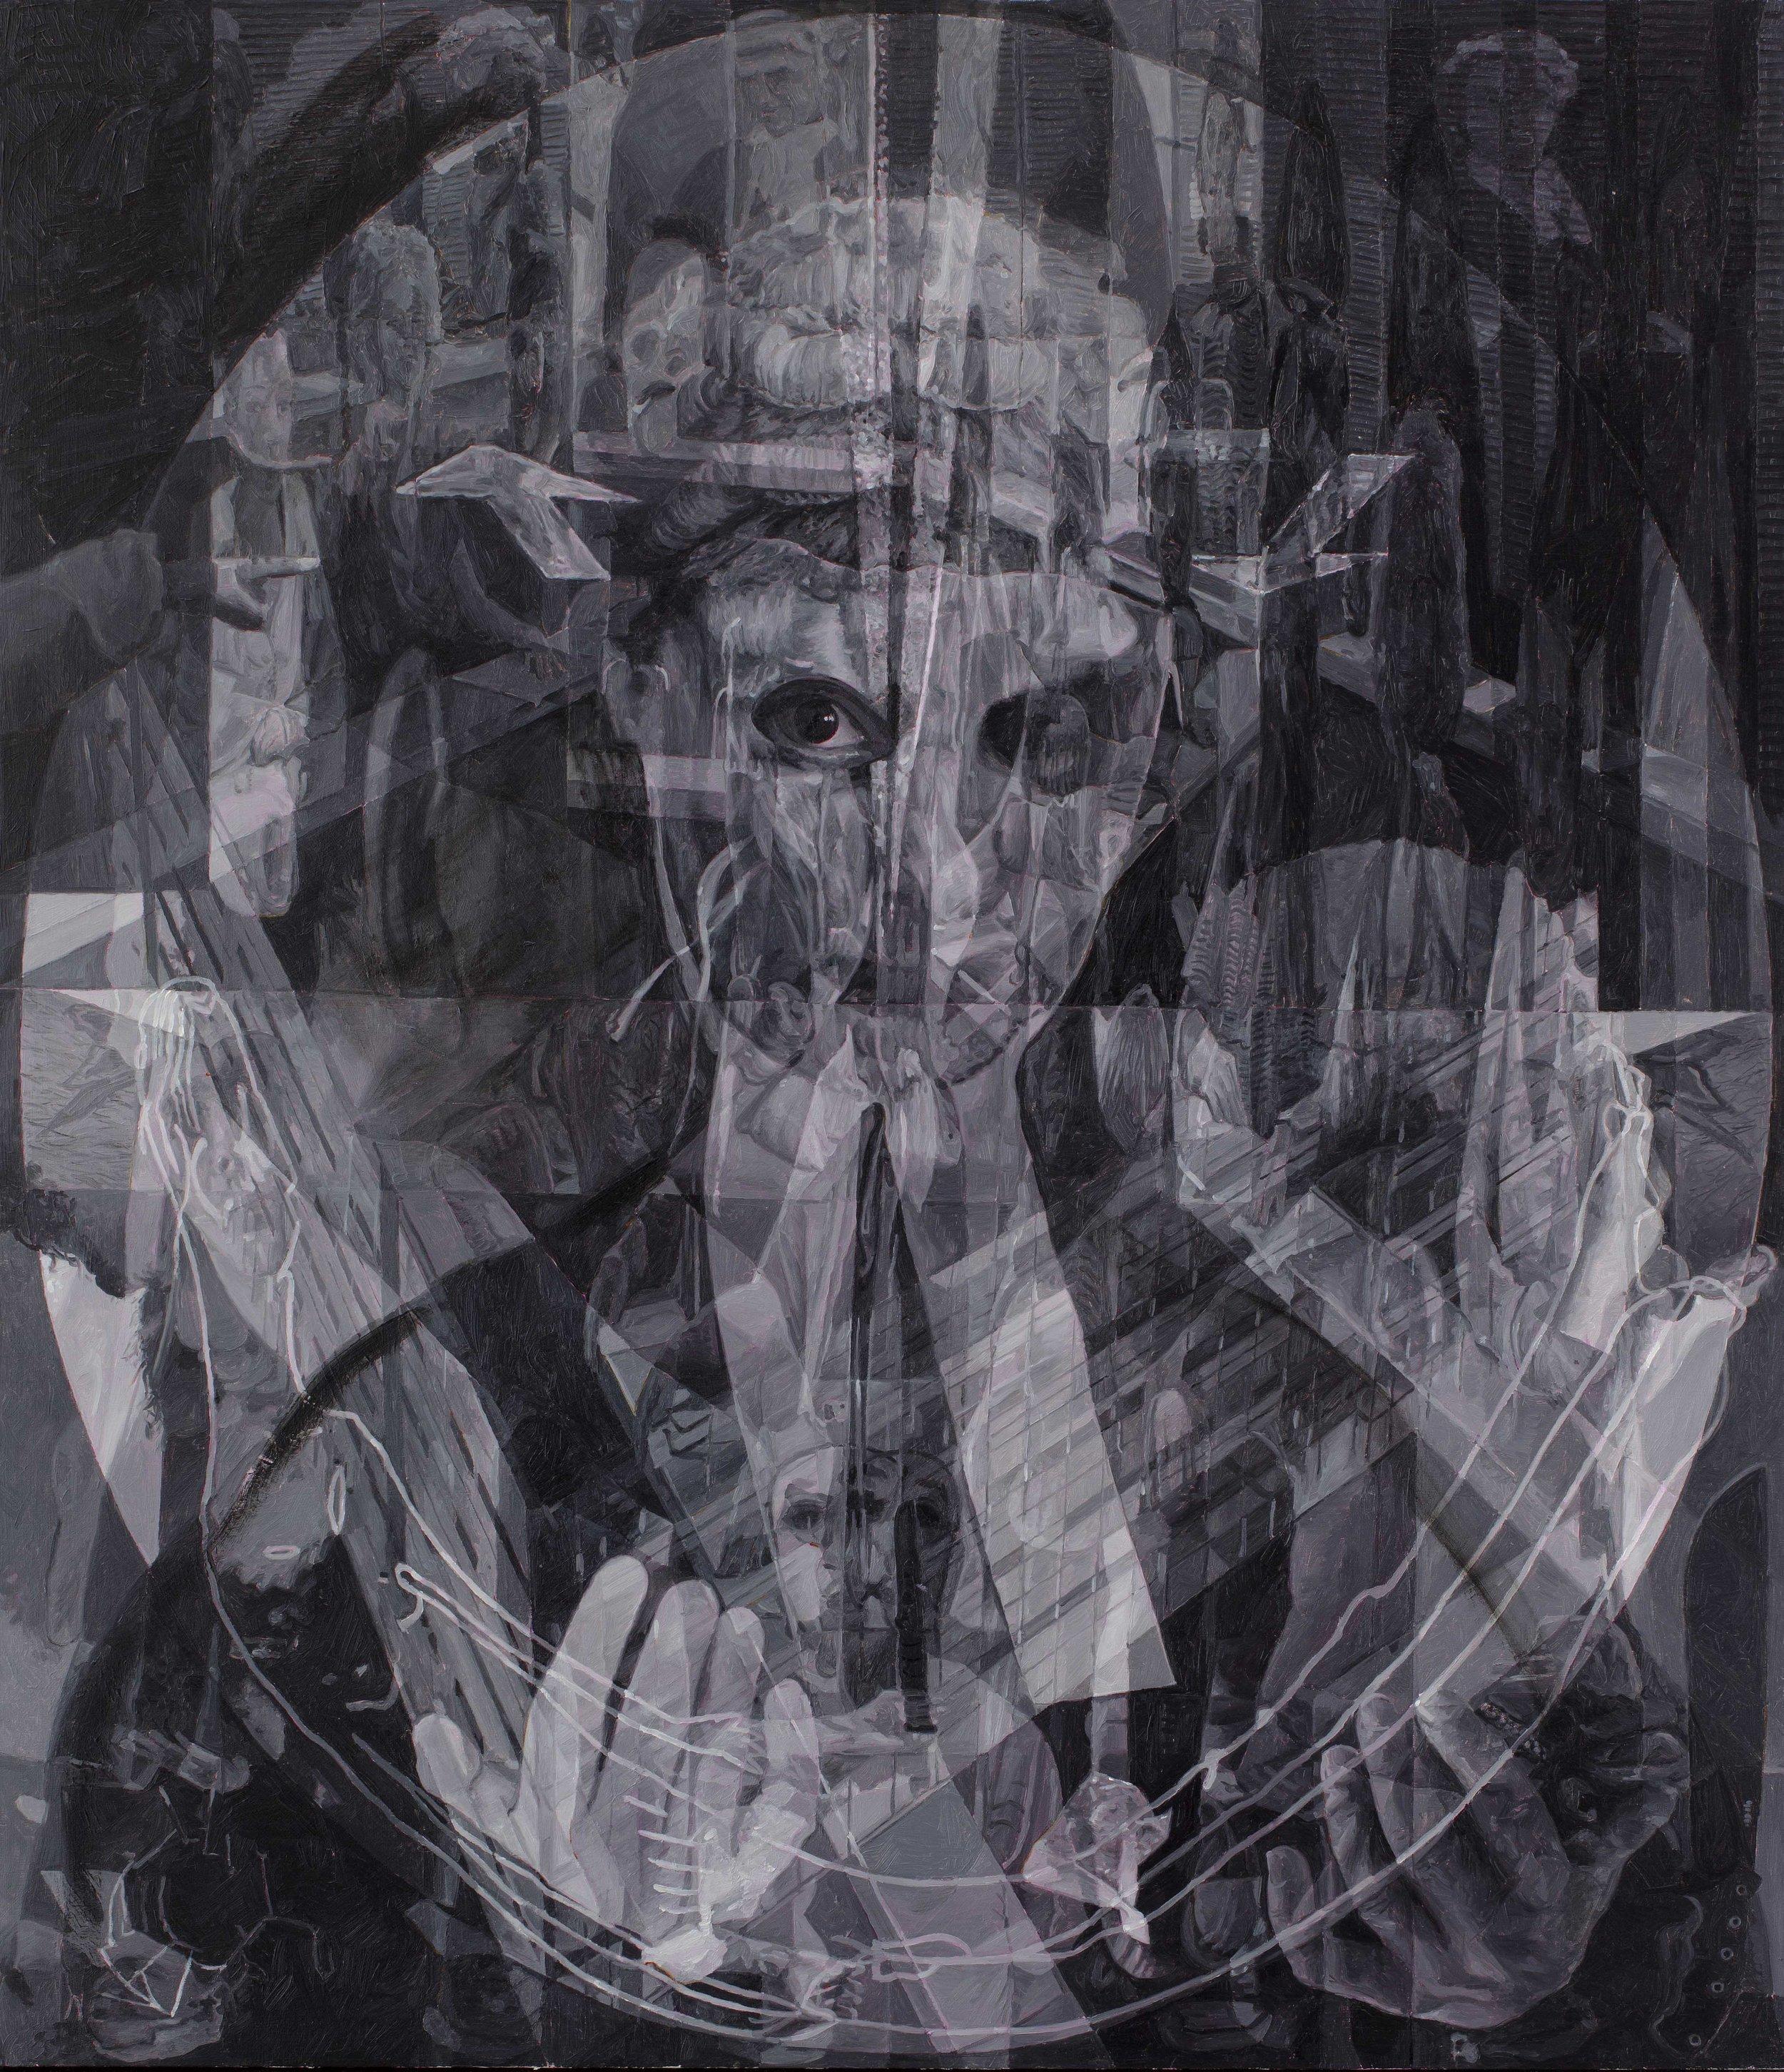 The Gatekeeper: Portrait of an Honourable Justice , oil on board, 122 x 106 cm, 2018.